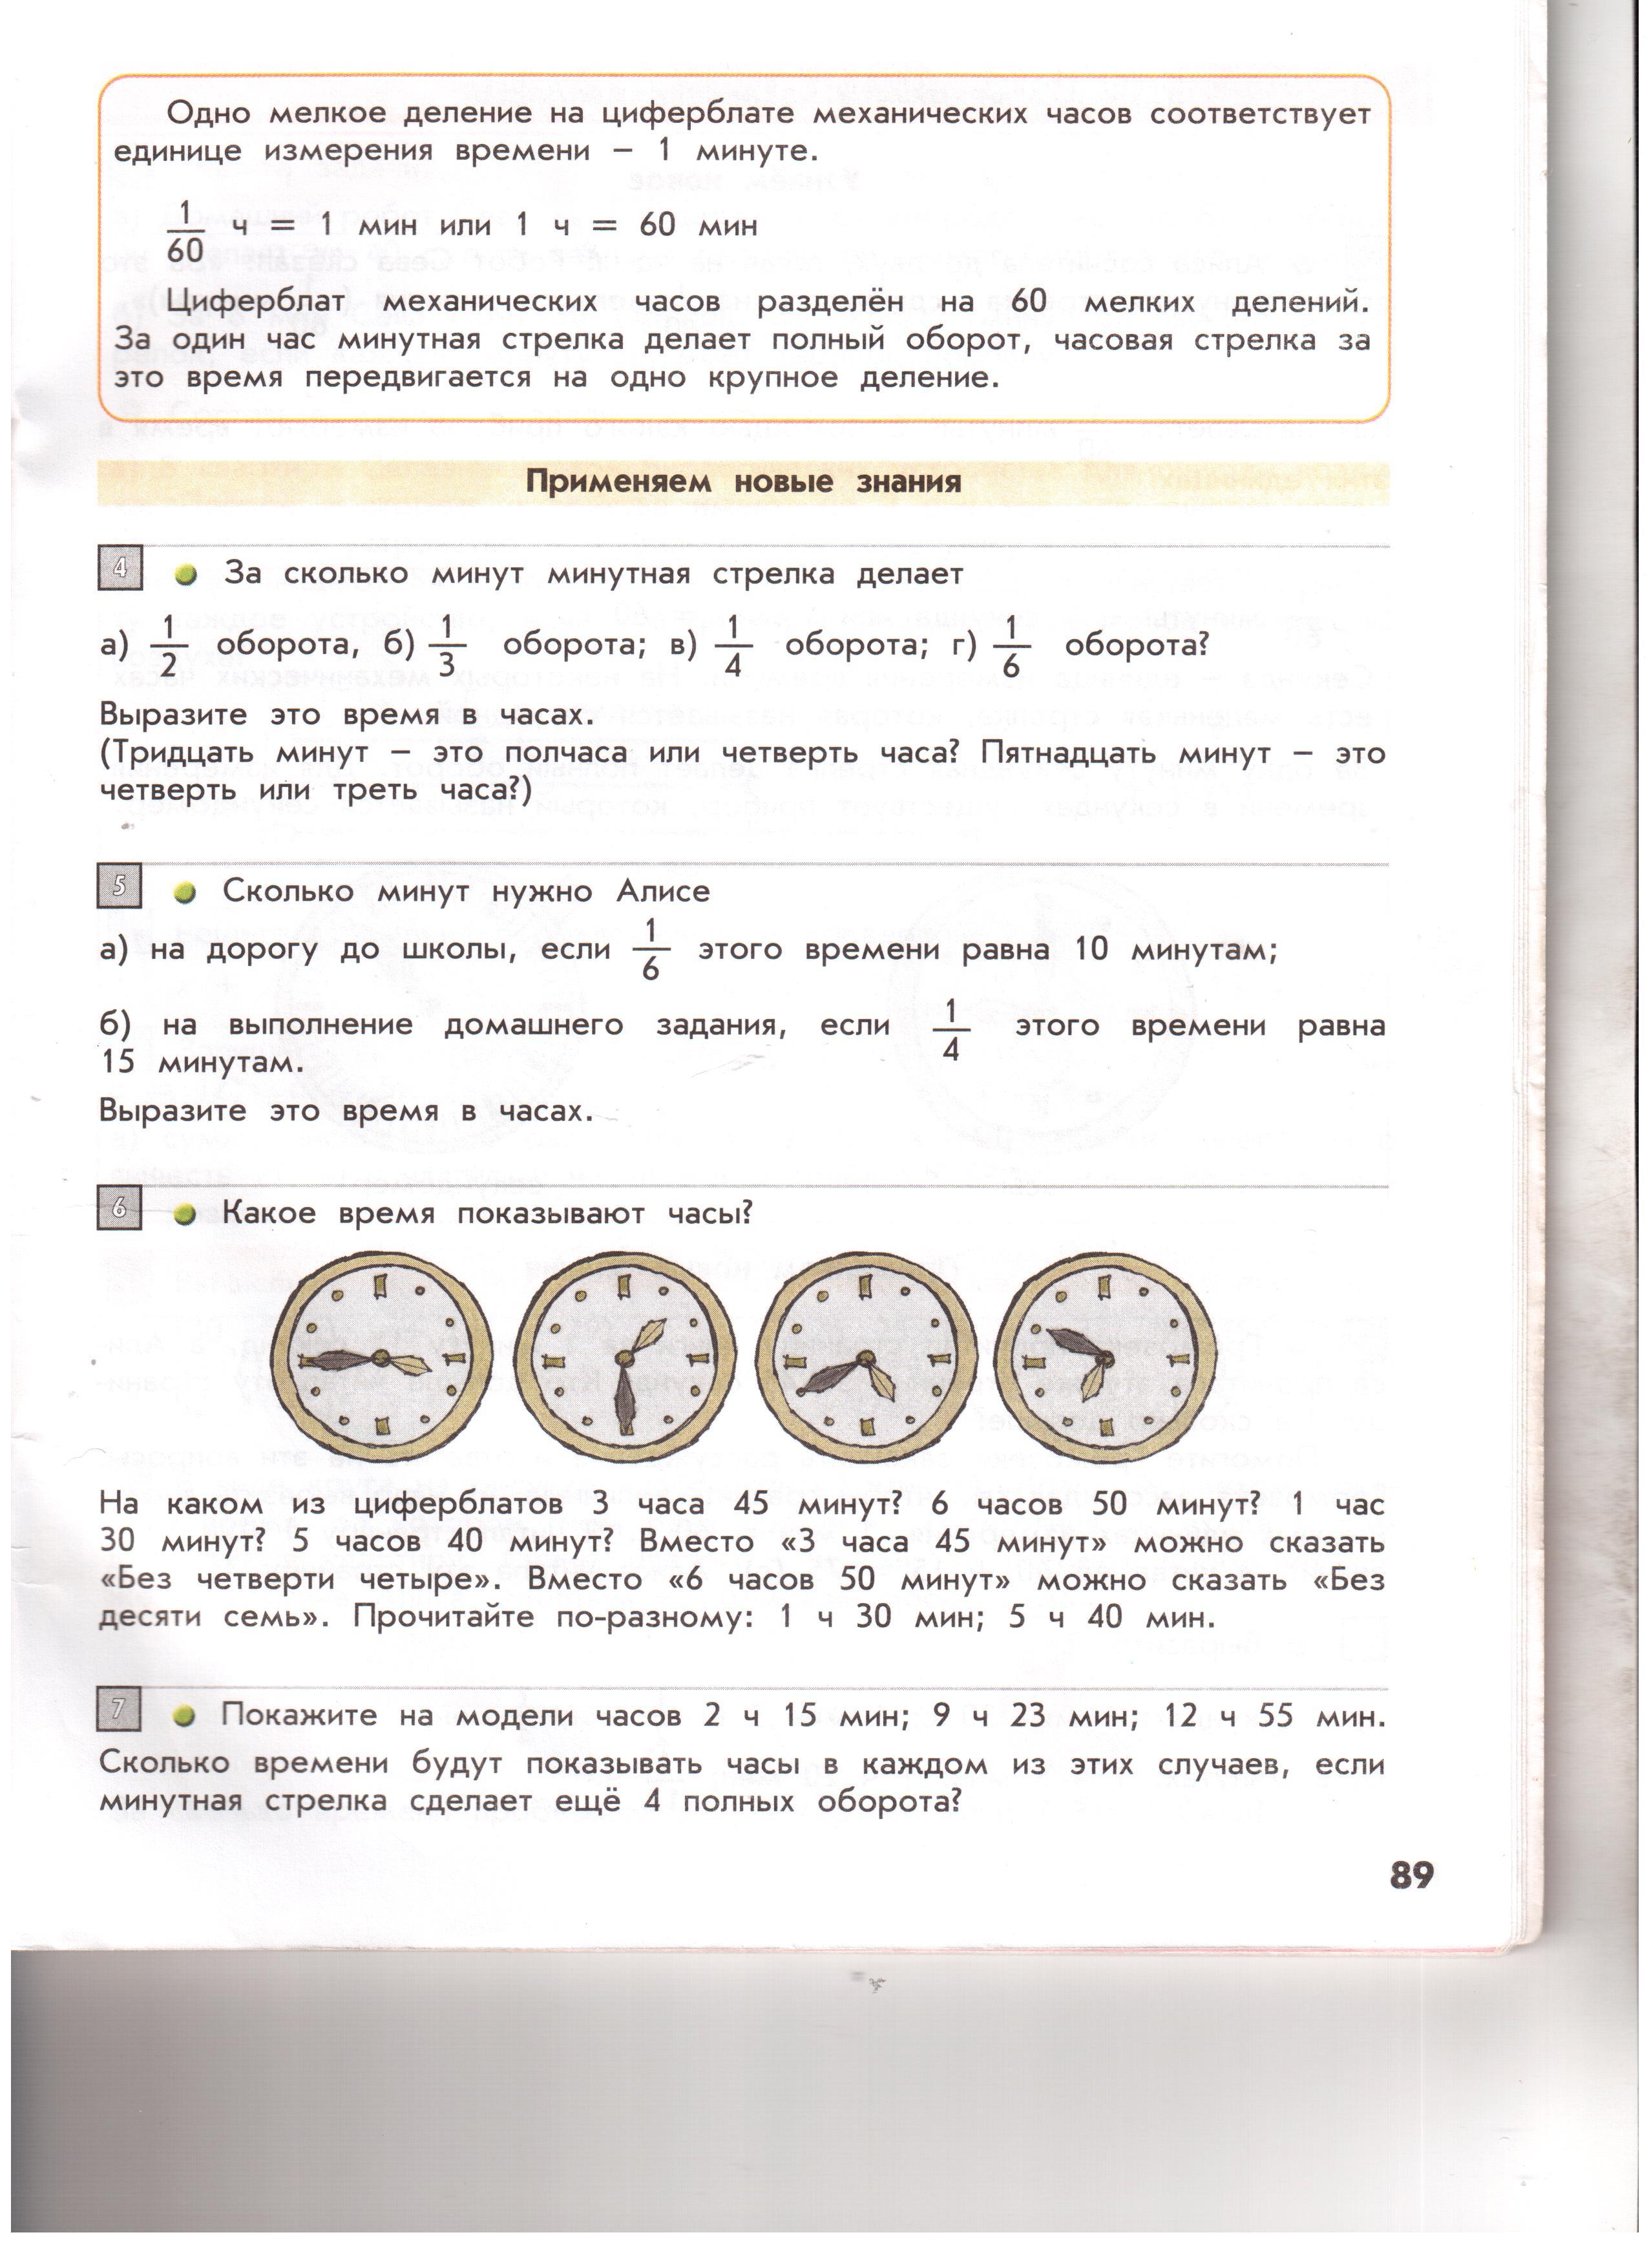 C:\Users\2класс\Documents\Scanned Documents\Рисунок (37).jpg